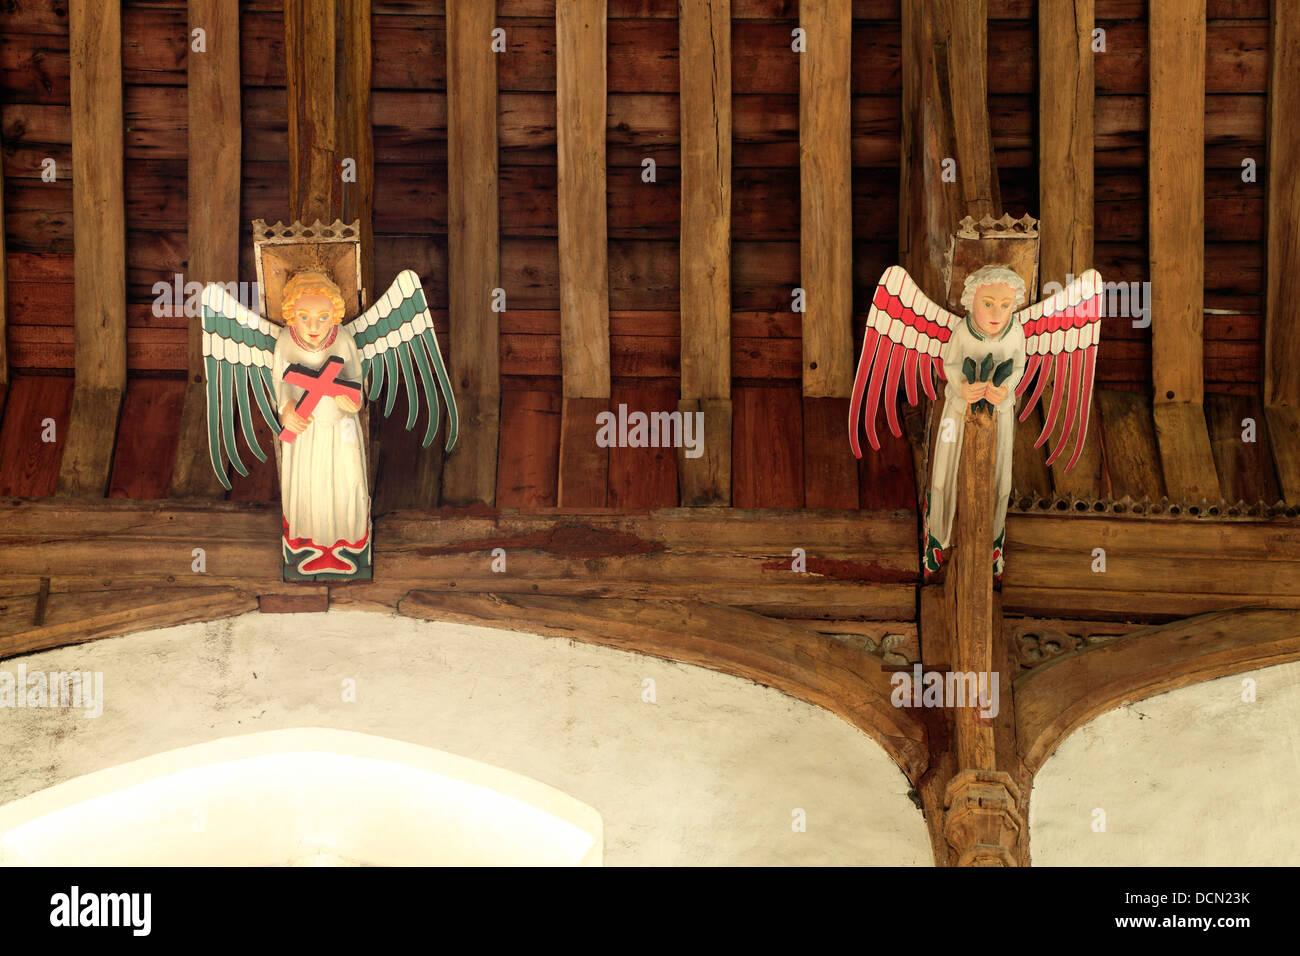 South Creake church, medieval hammerbeam roof, angels angel, Norfolk, England, roofs hammer beam beams - Stock Image